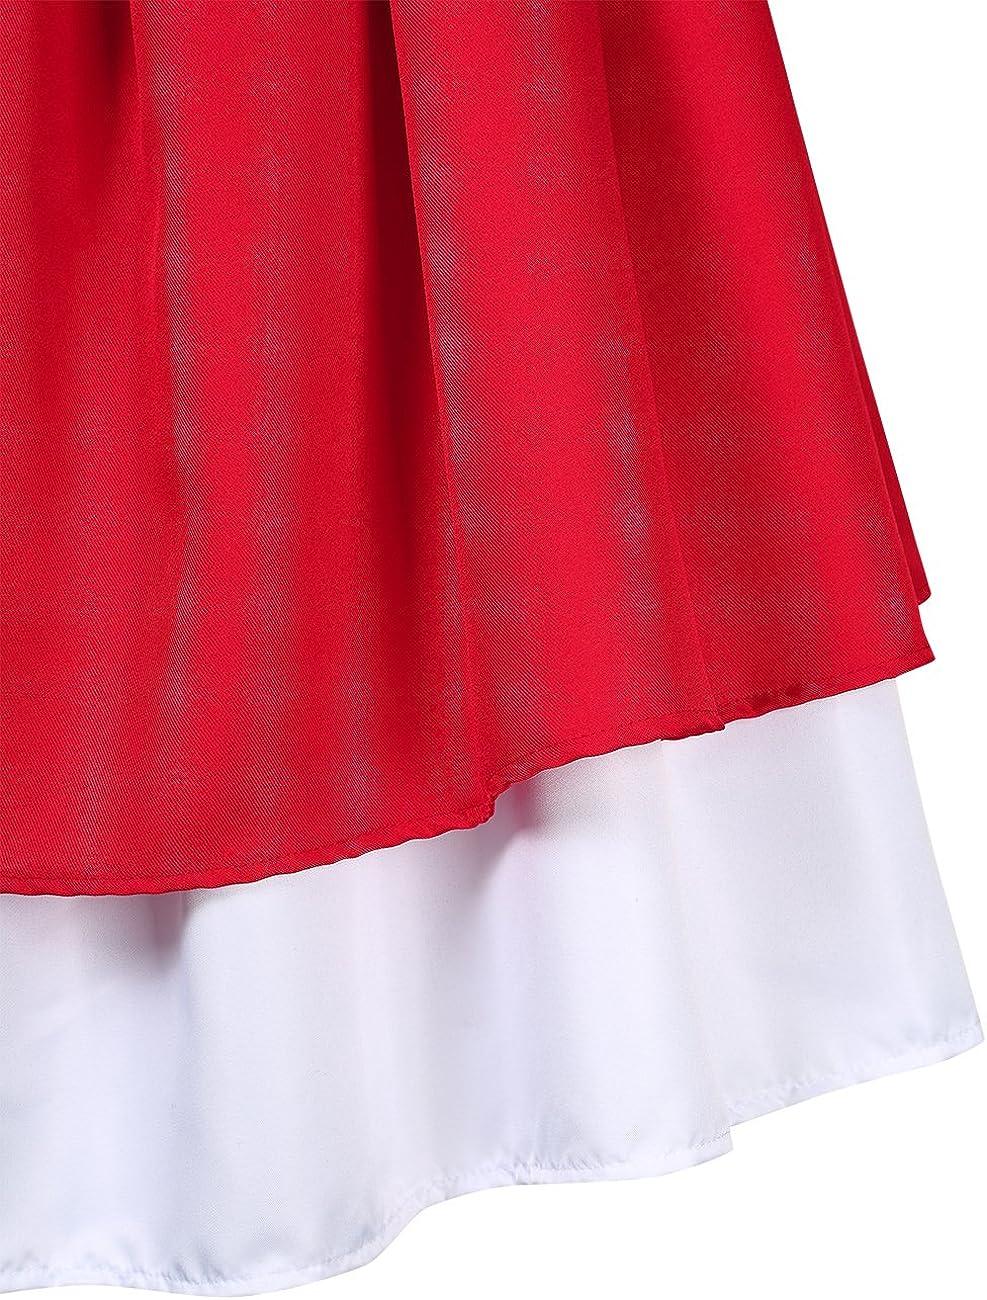 Chemisier Midi Robe Traditionnelle pour lOktoberfest Polka Dot Violet KOJOOIN Vetement Dirndl pour Femme Trois Pi/èces: Robe